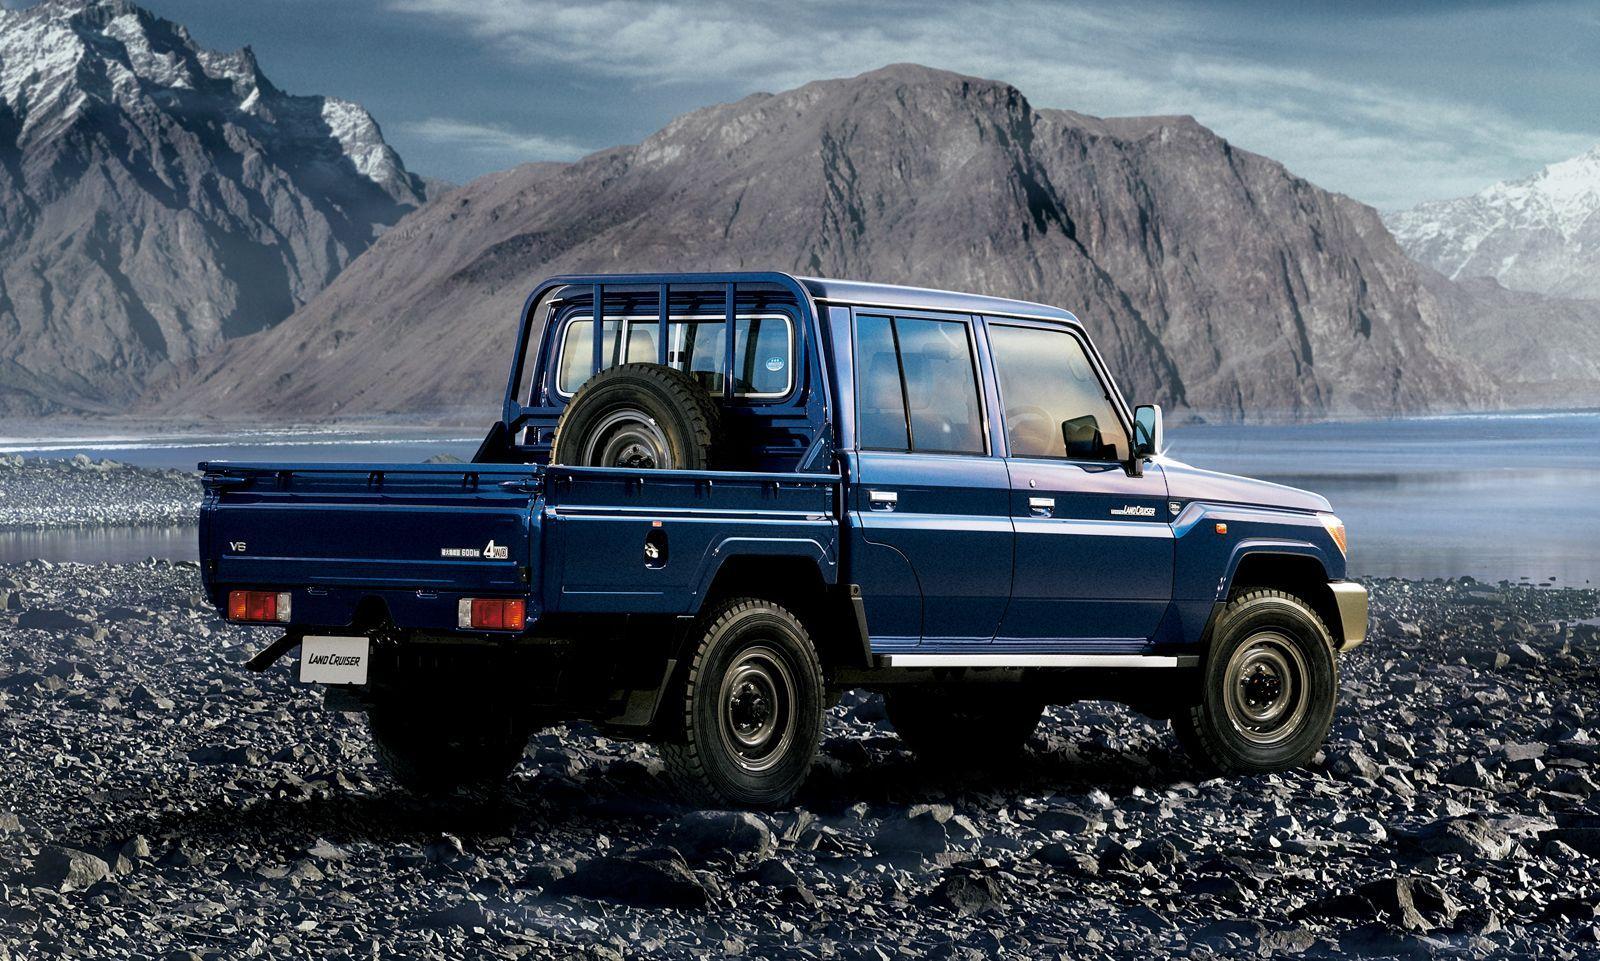 Toyota-Land-Cruiser-70-Series-17